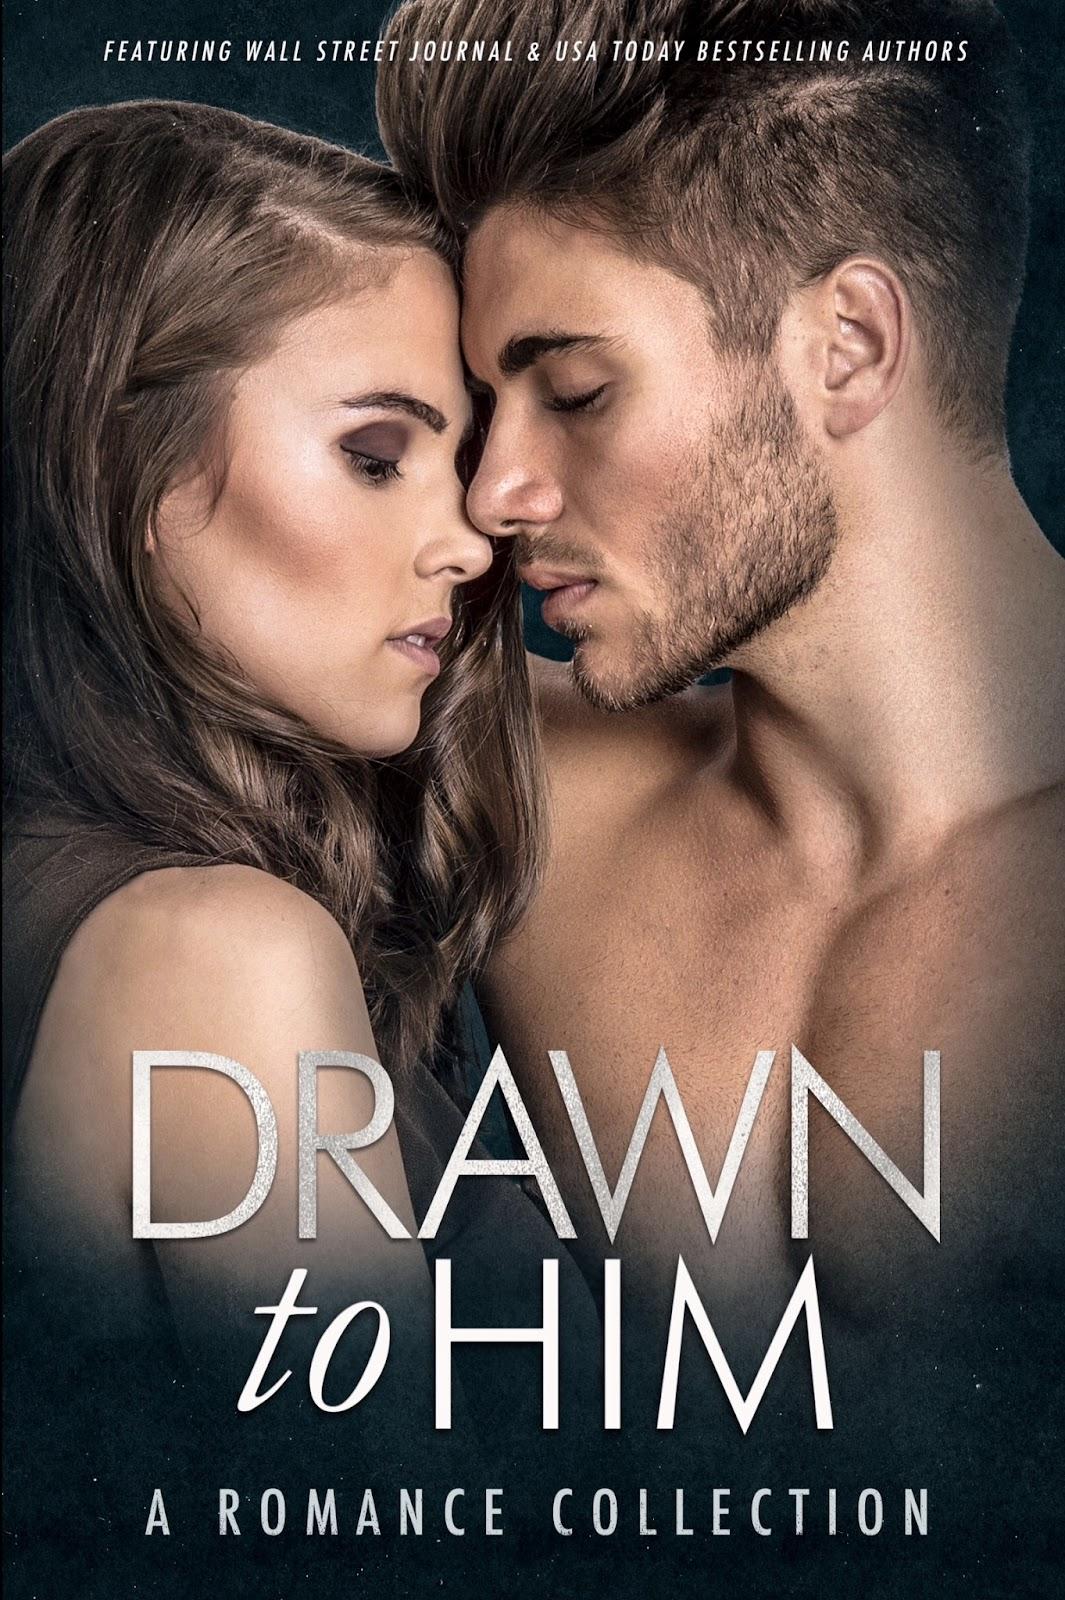 [Review] DRAWN TO HIM: A ROMANCE COLLECTION @KristiWebster @klkreig @AZavarellibooks @jadewestauthor @MNeverAuthor @lj_shen @willowwintersbb  @authorstarling #excerpt